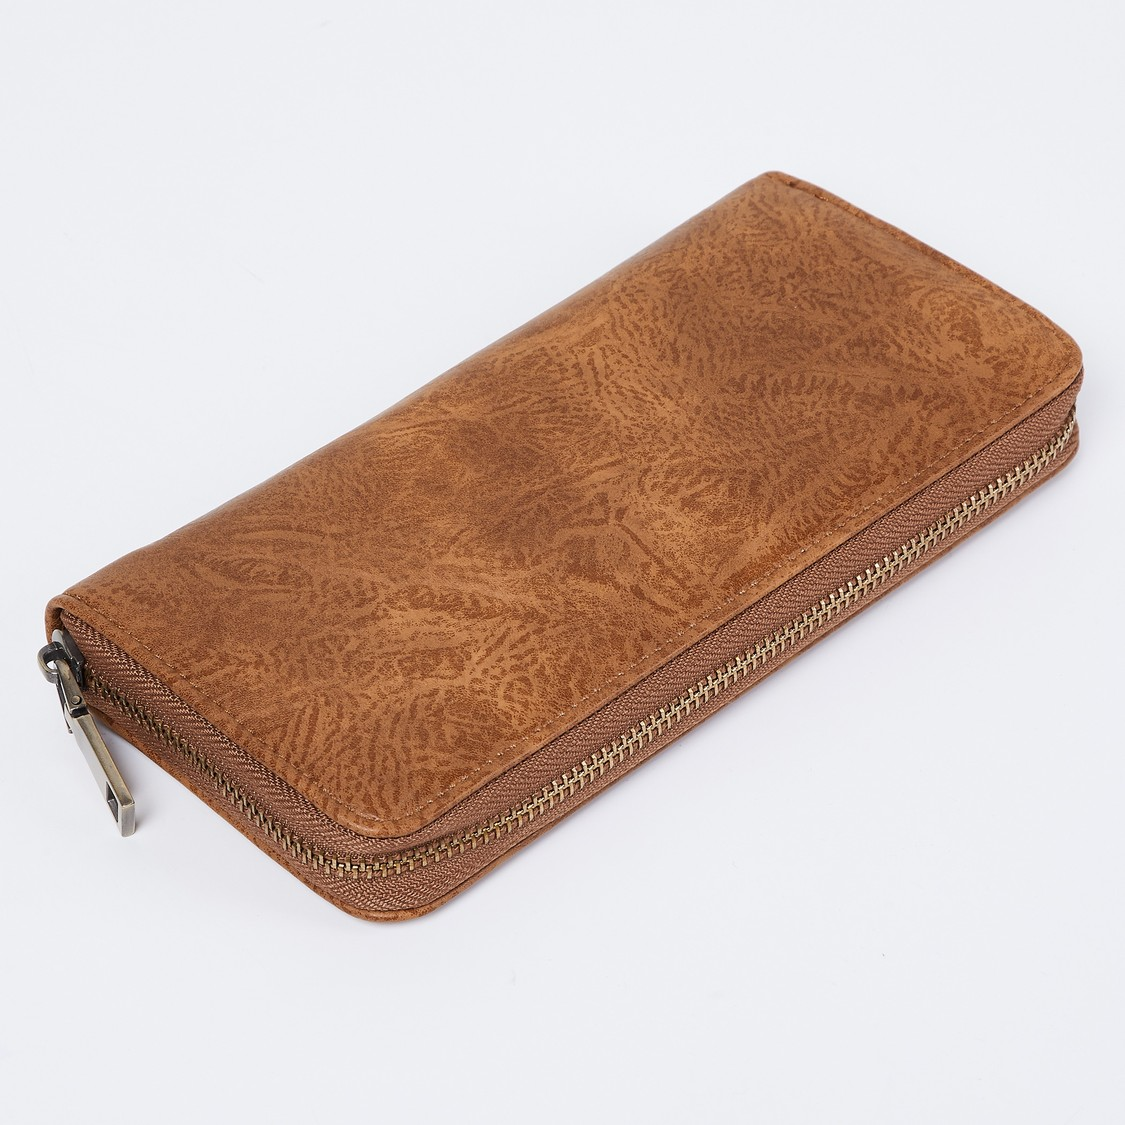 MAX Embroidered Zip-Around Wallet